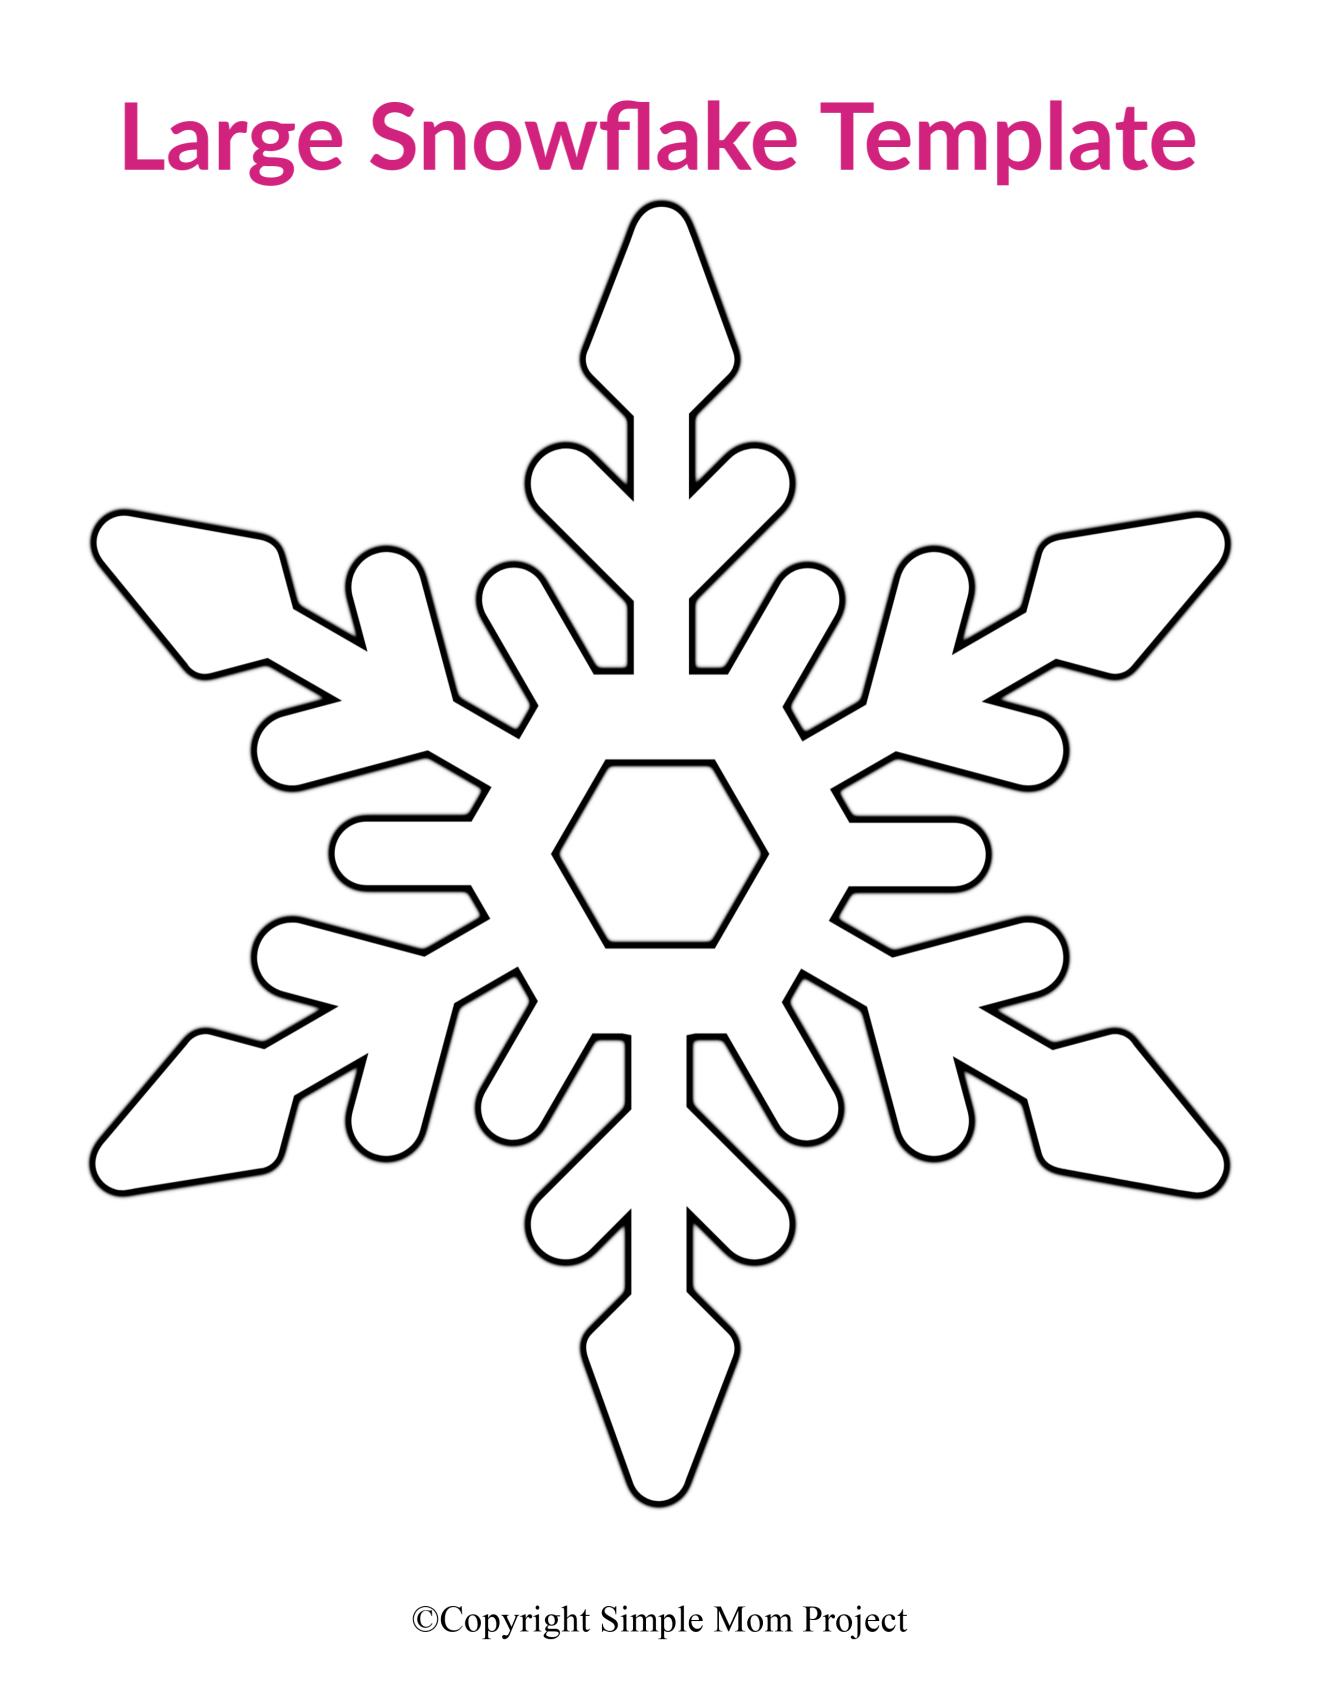 29 Free Printable Large Snowflake Templates  Snowflake coloring